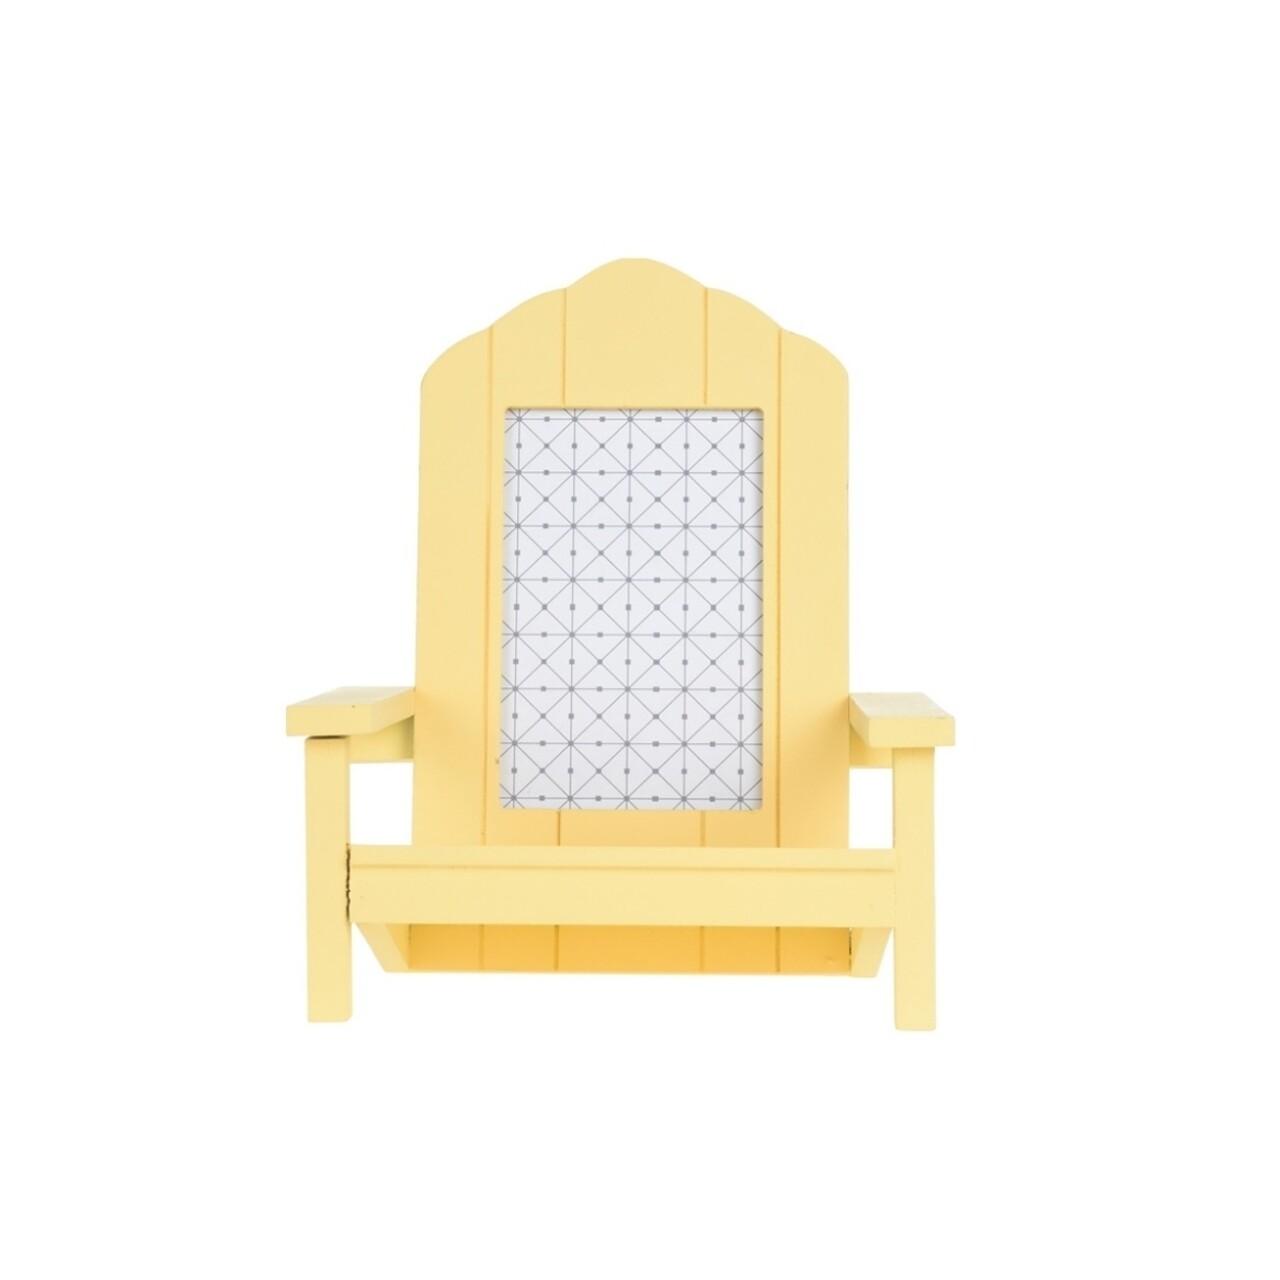 Ramă foto Beach Chair, 20 x 19 x 23 cm, MDF, galben